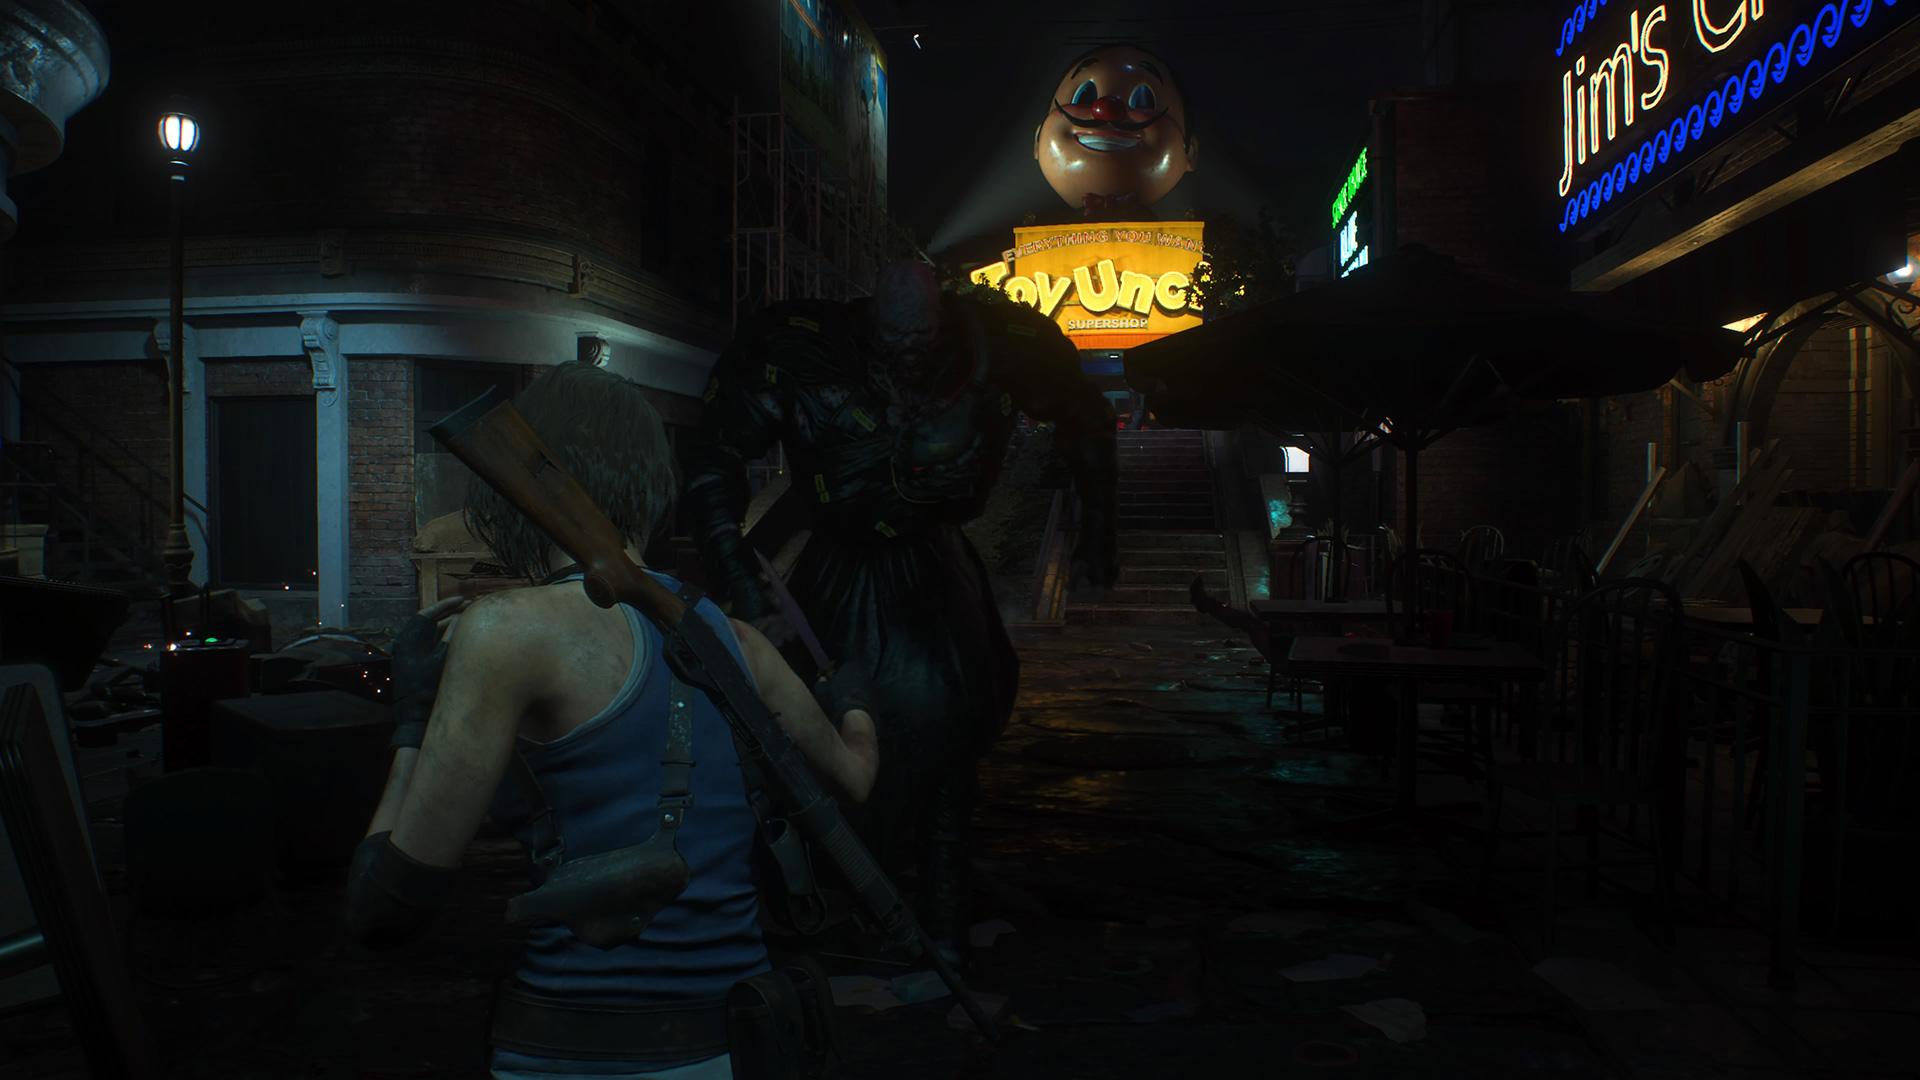 I Can T Delete The Resident Evil 3 Demo Until I Master Dodging